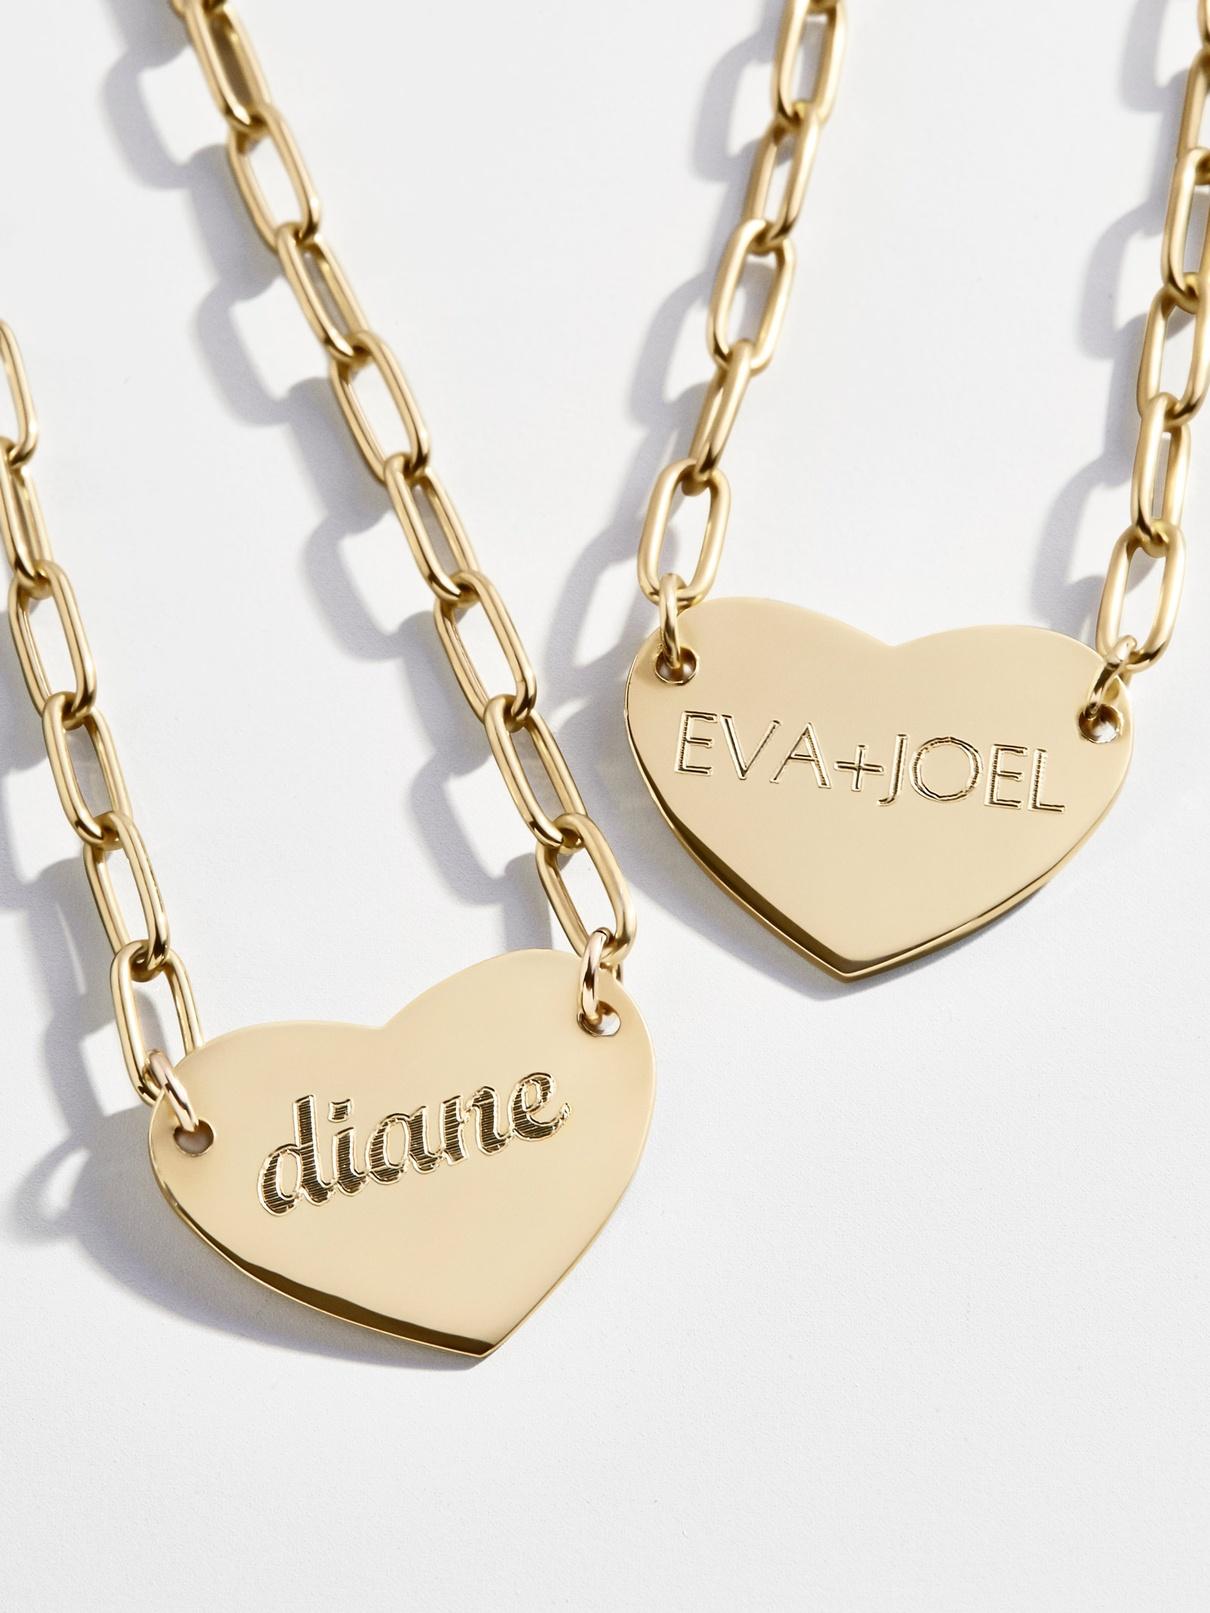 baublebar chain necklace